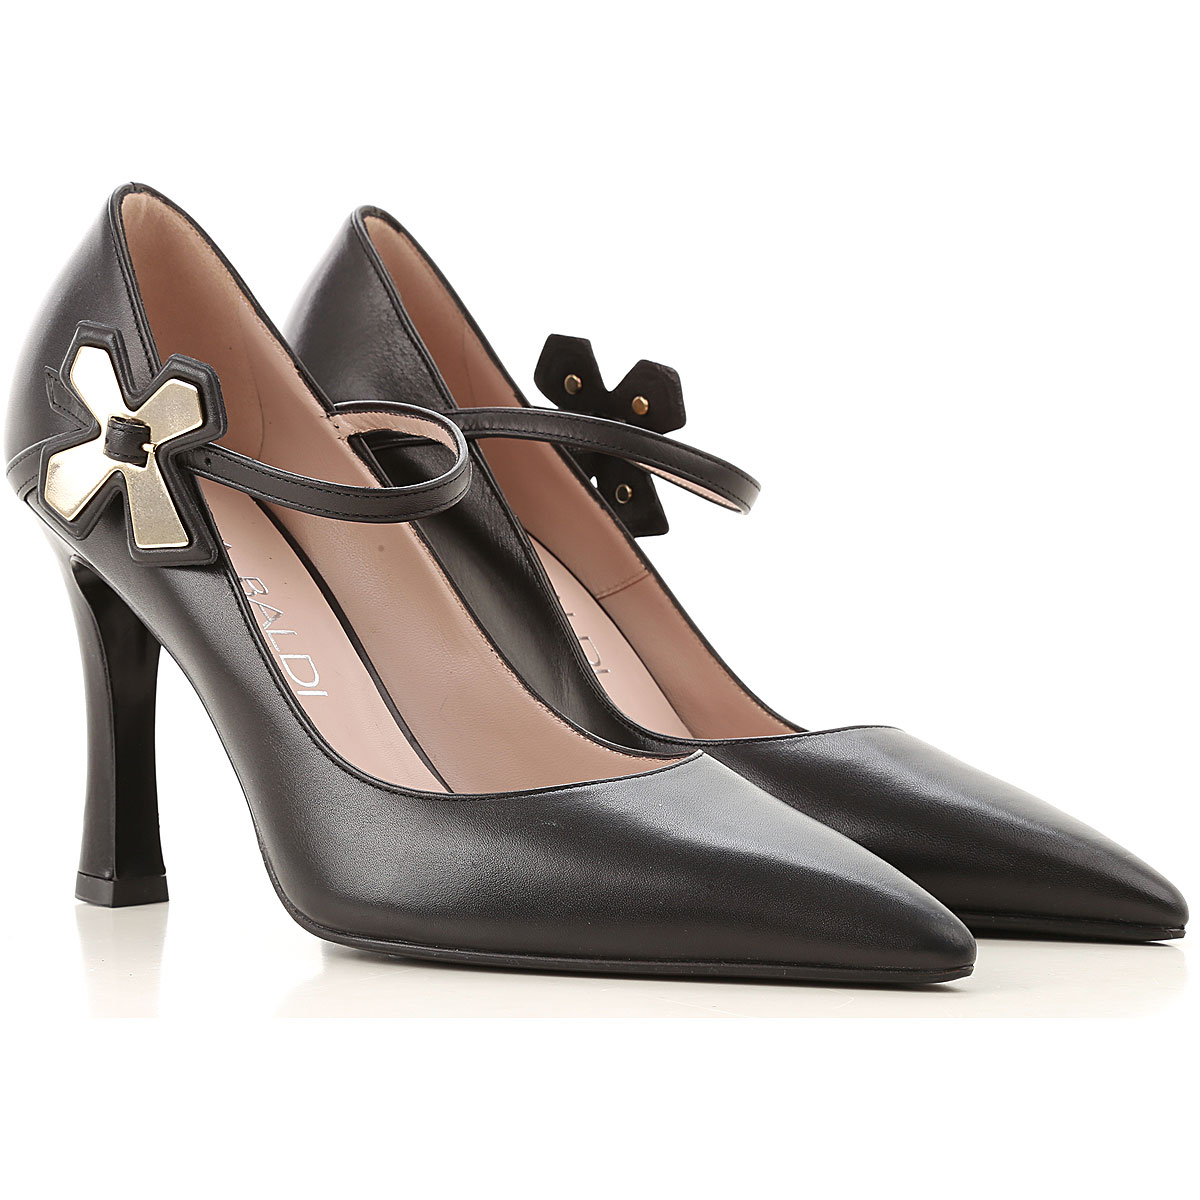 Lella Baldi Pumps & High Heels for Women On Sale, Black, Leather, 2019, 6 7 8